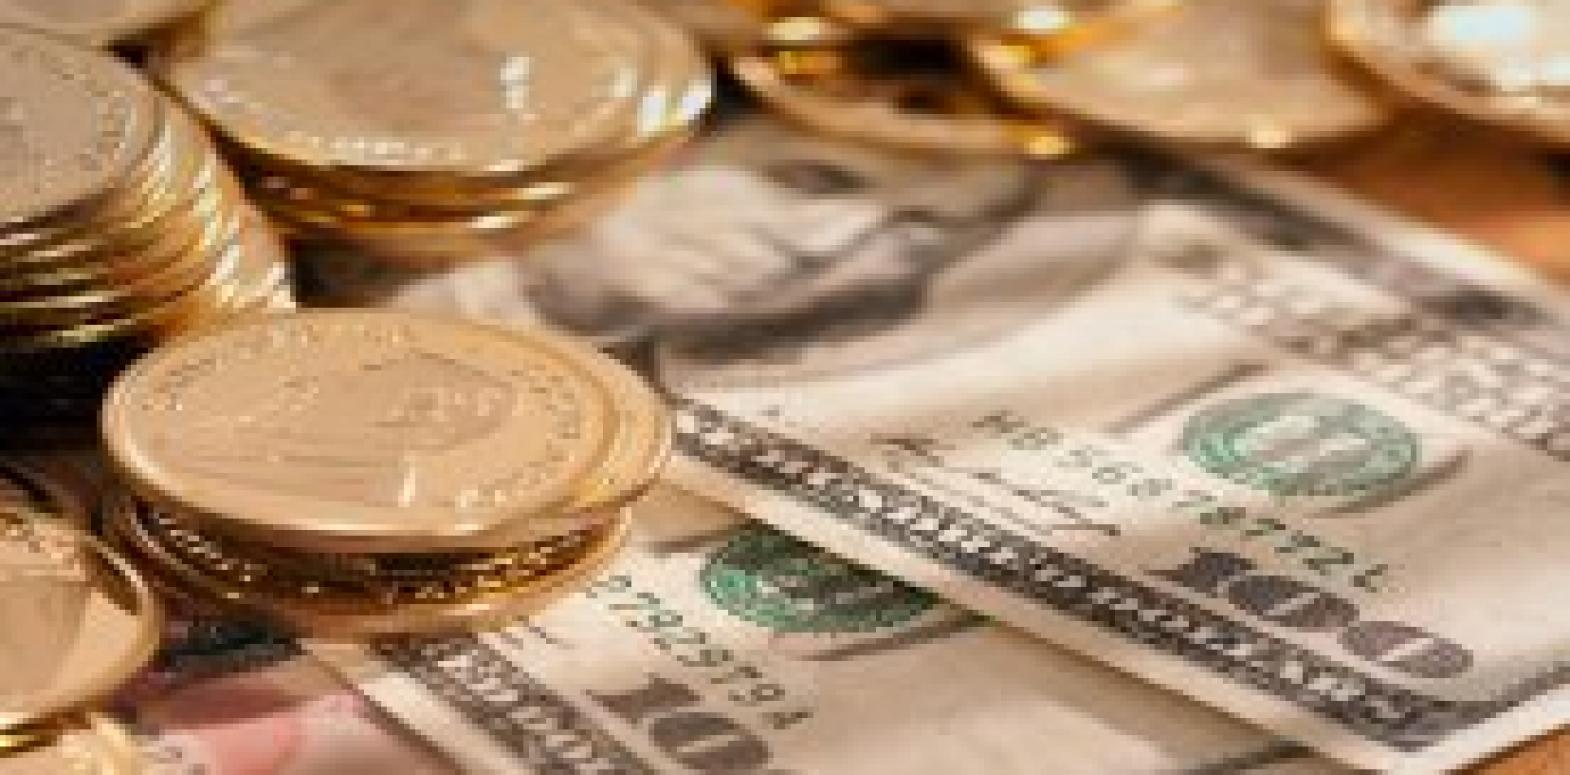 Наличный курс на 25 февраля: доллар - 24,30-24,51 грн, евро - 26,30-26,65 грн